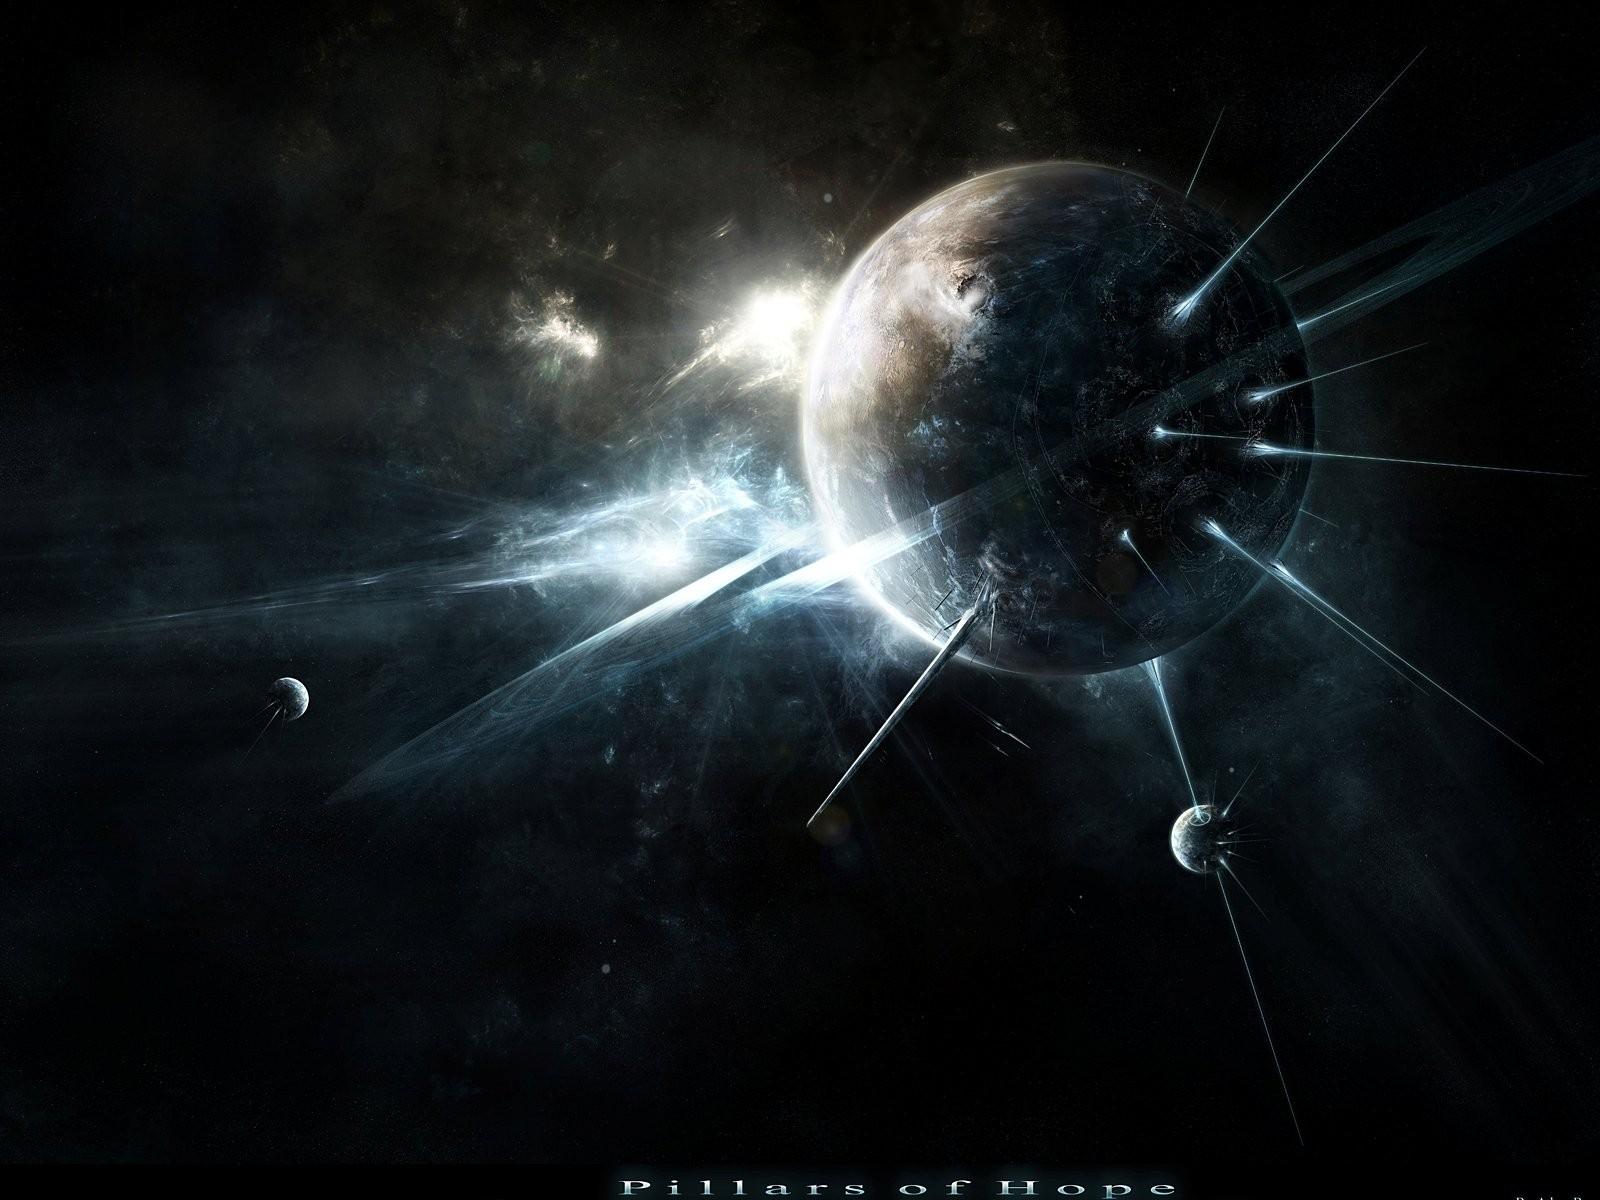 General 1600x1200 planet digital art